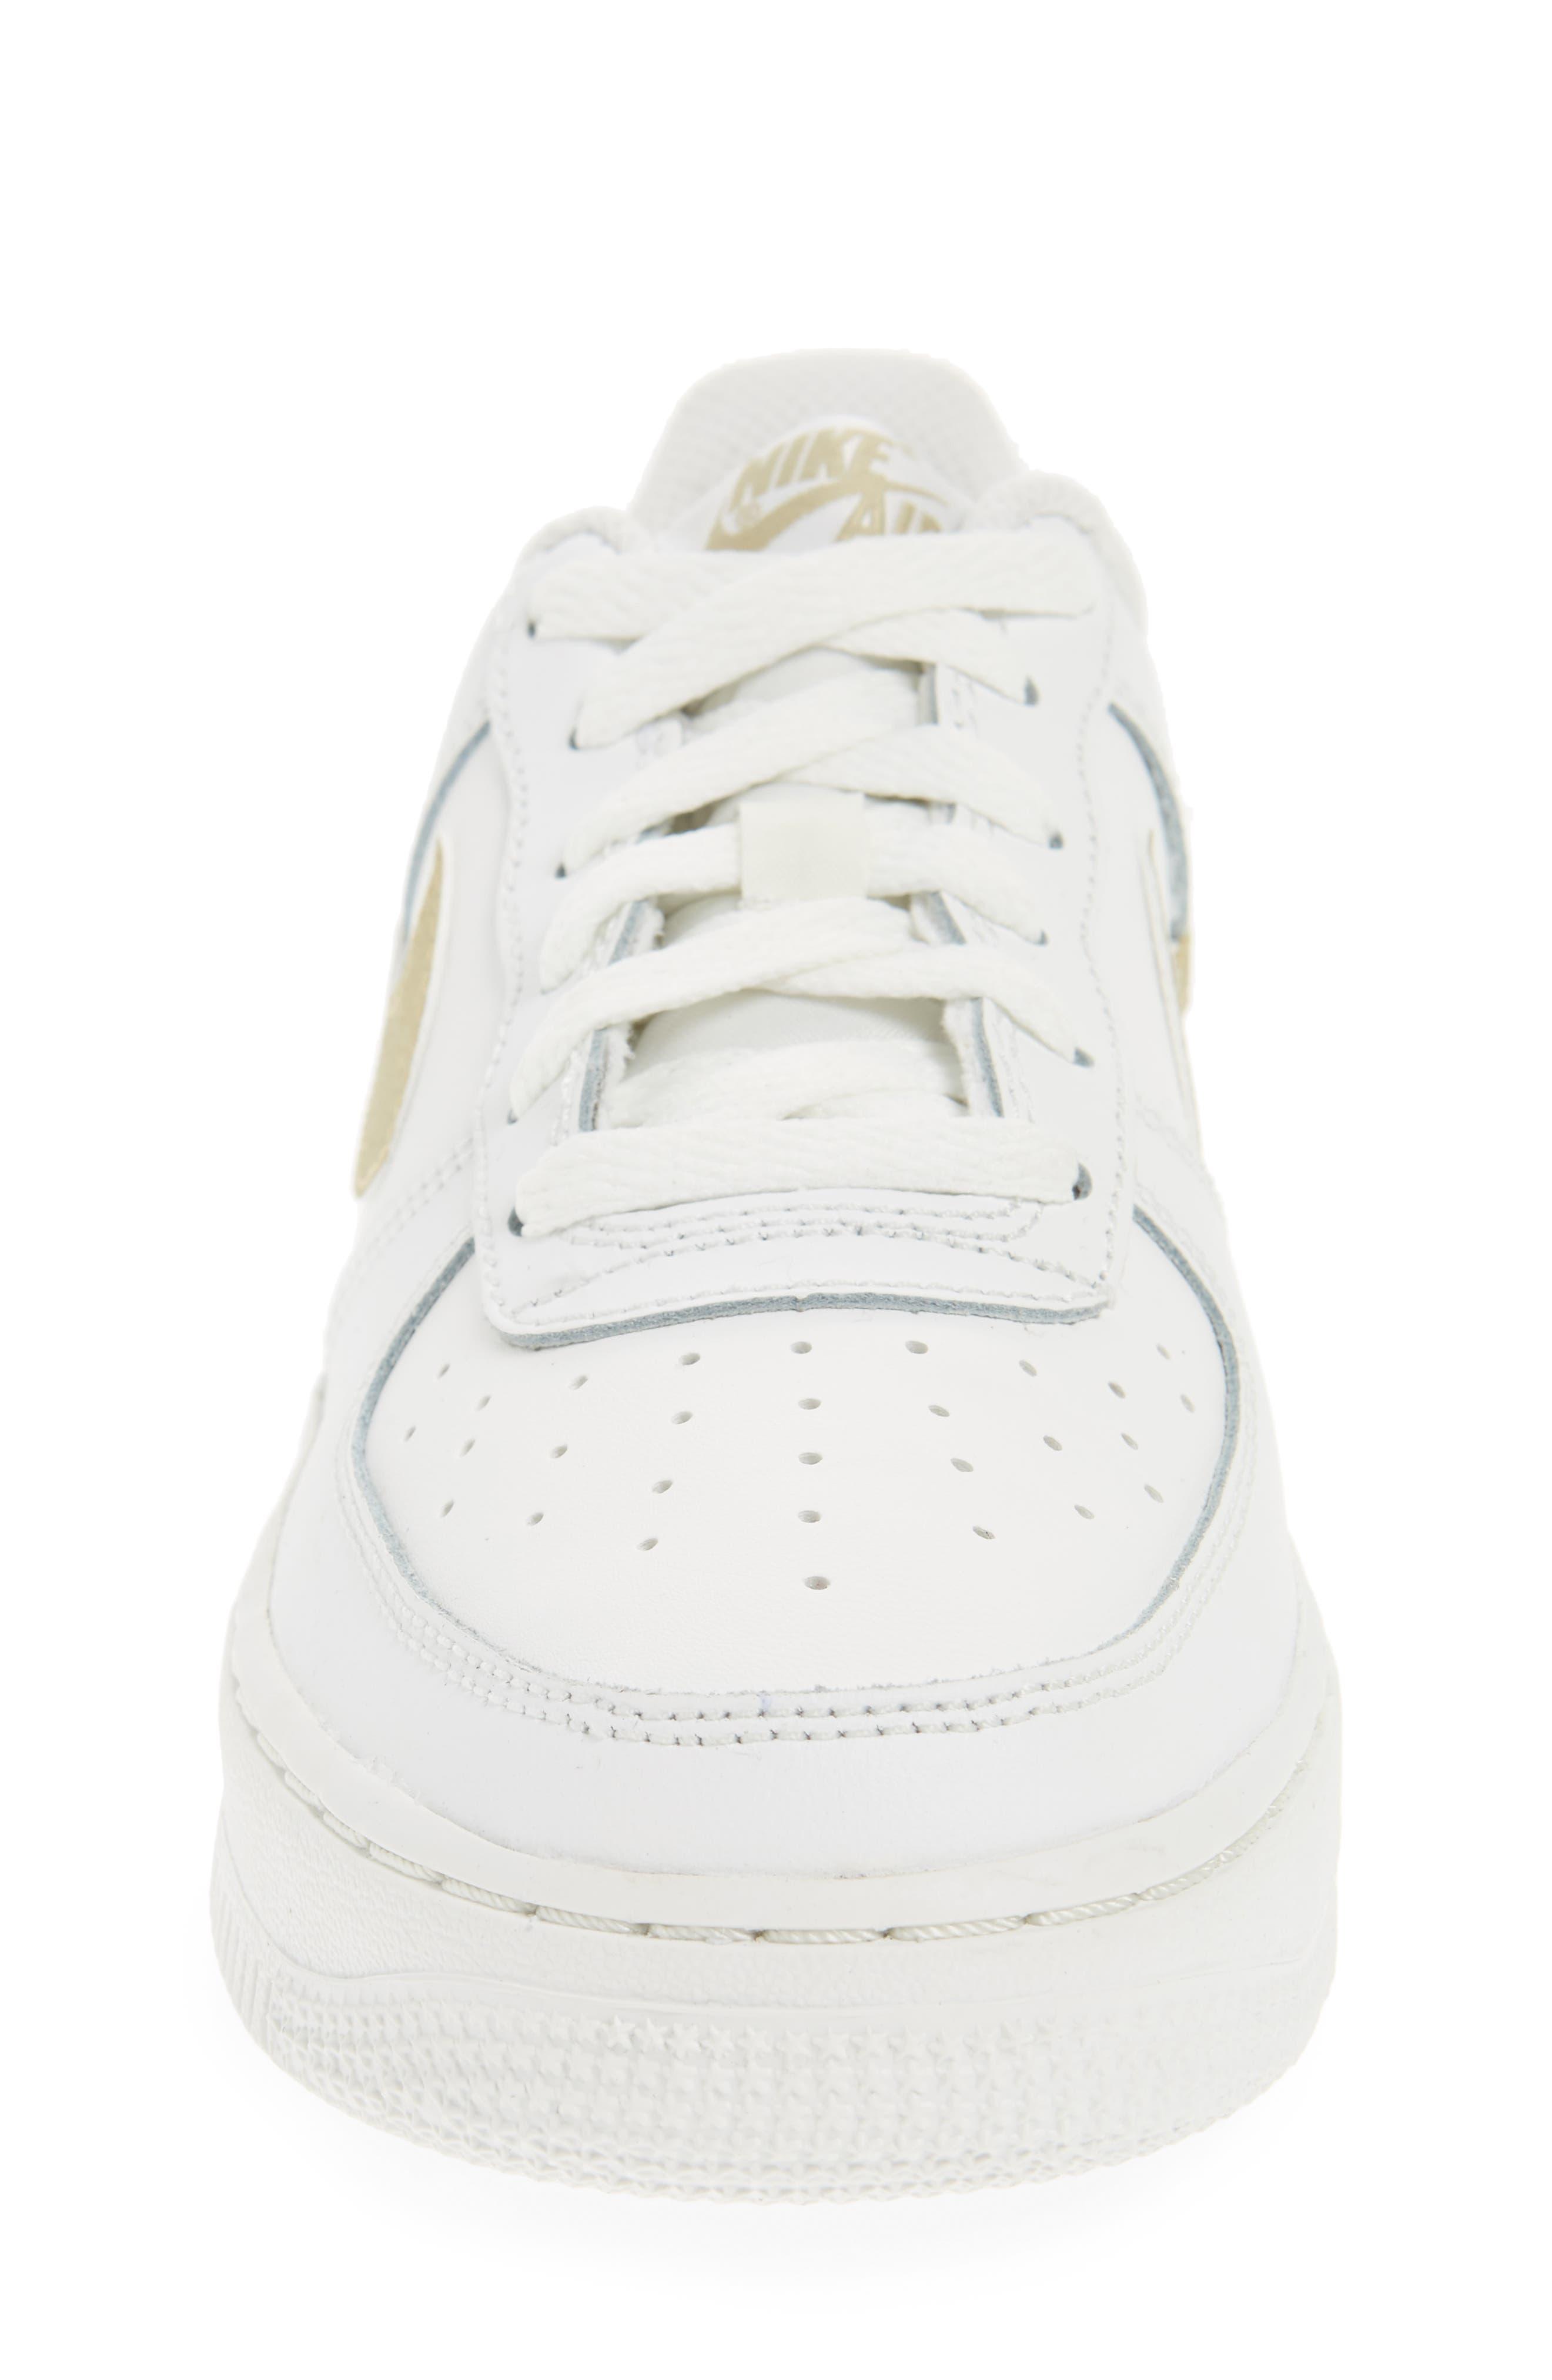 Air Force 1 '06 Sneaker,                             Alternate thumbnail 10, color,